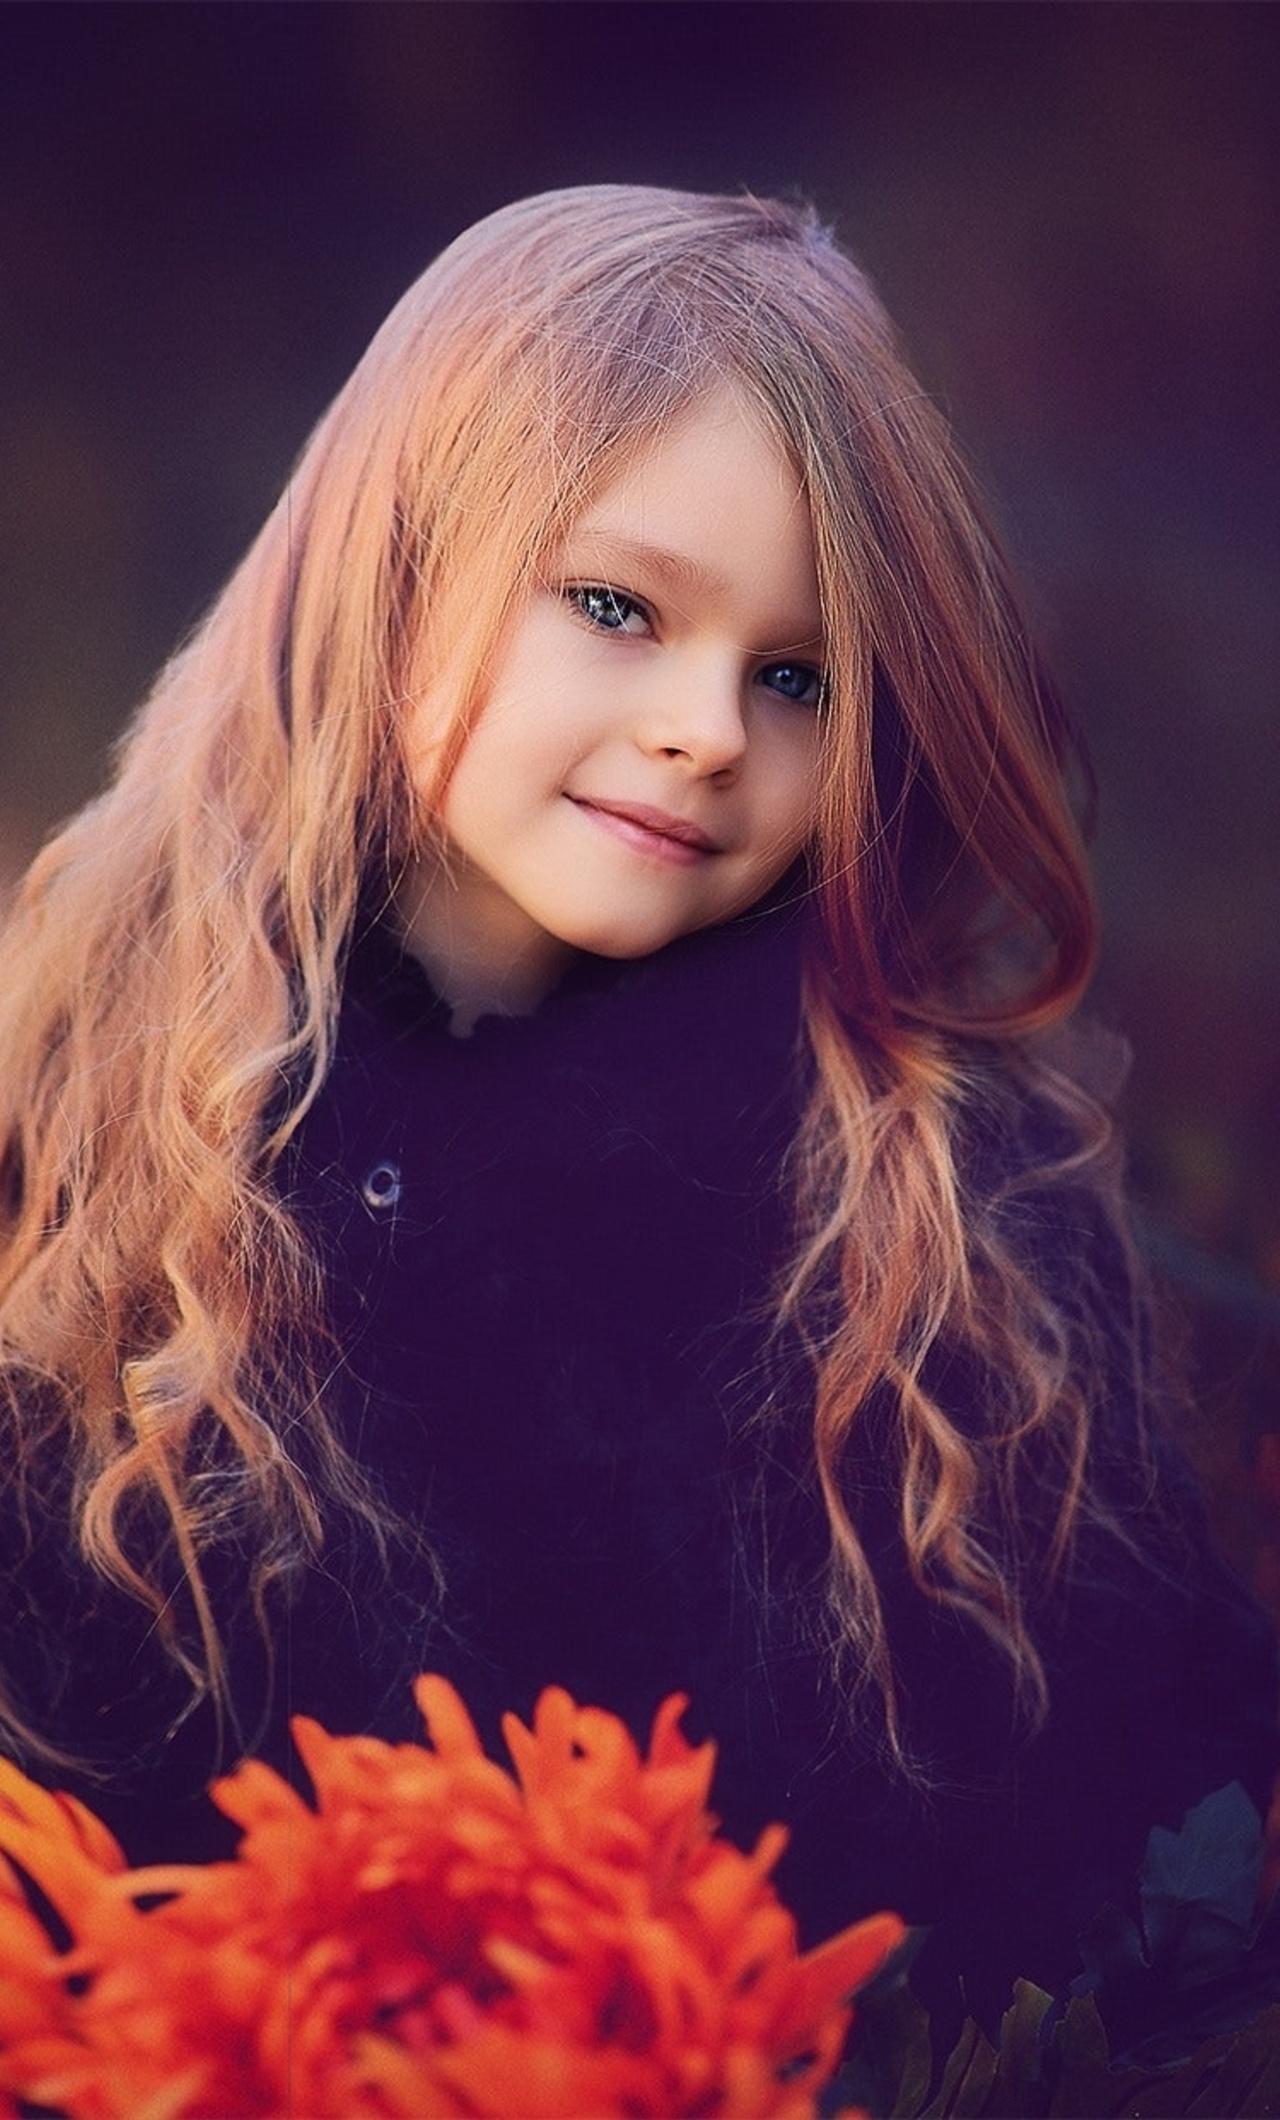 cute-little-girl-with-flowers-ez.jpg